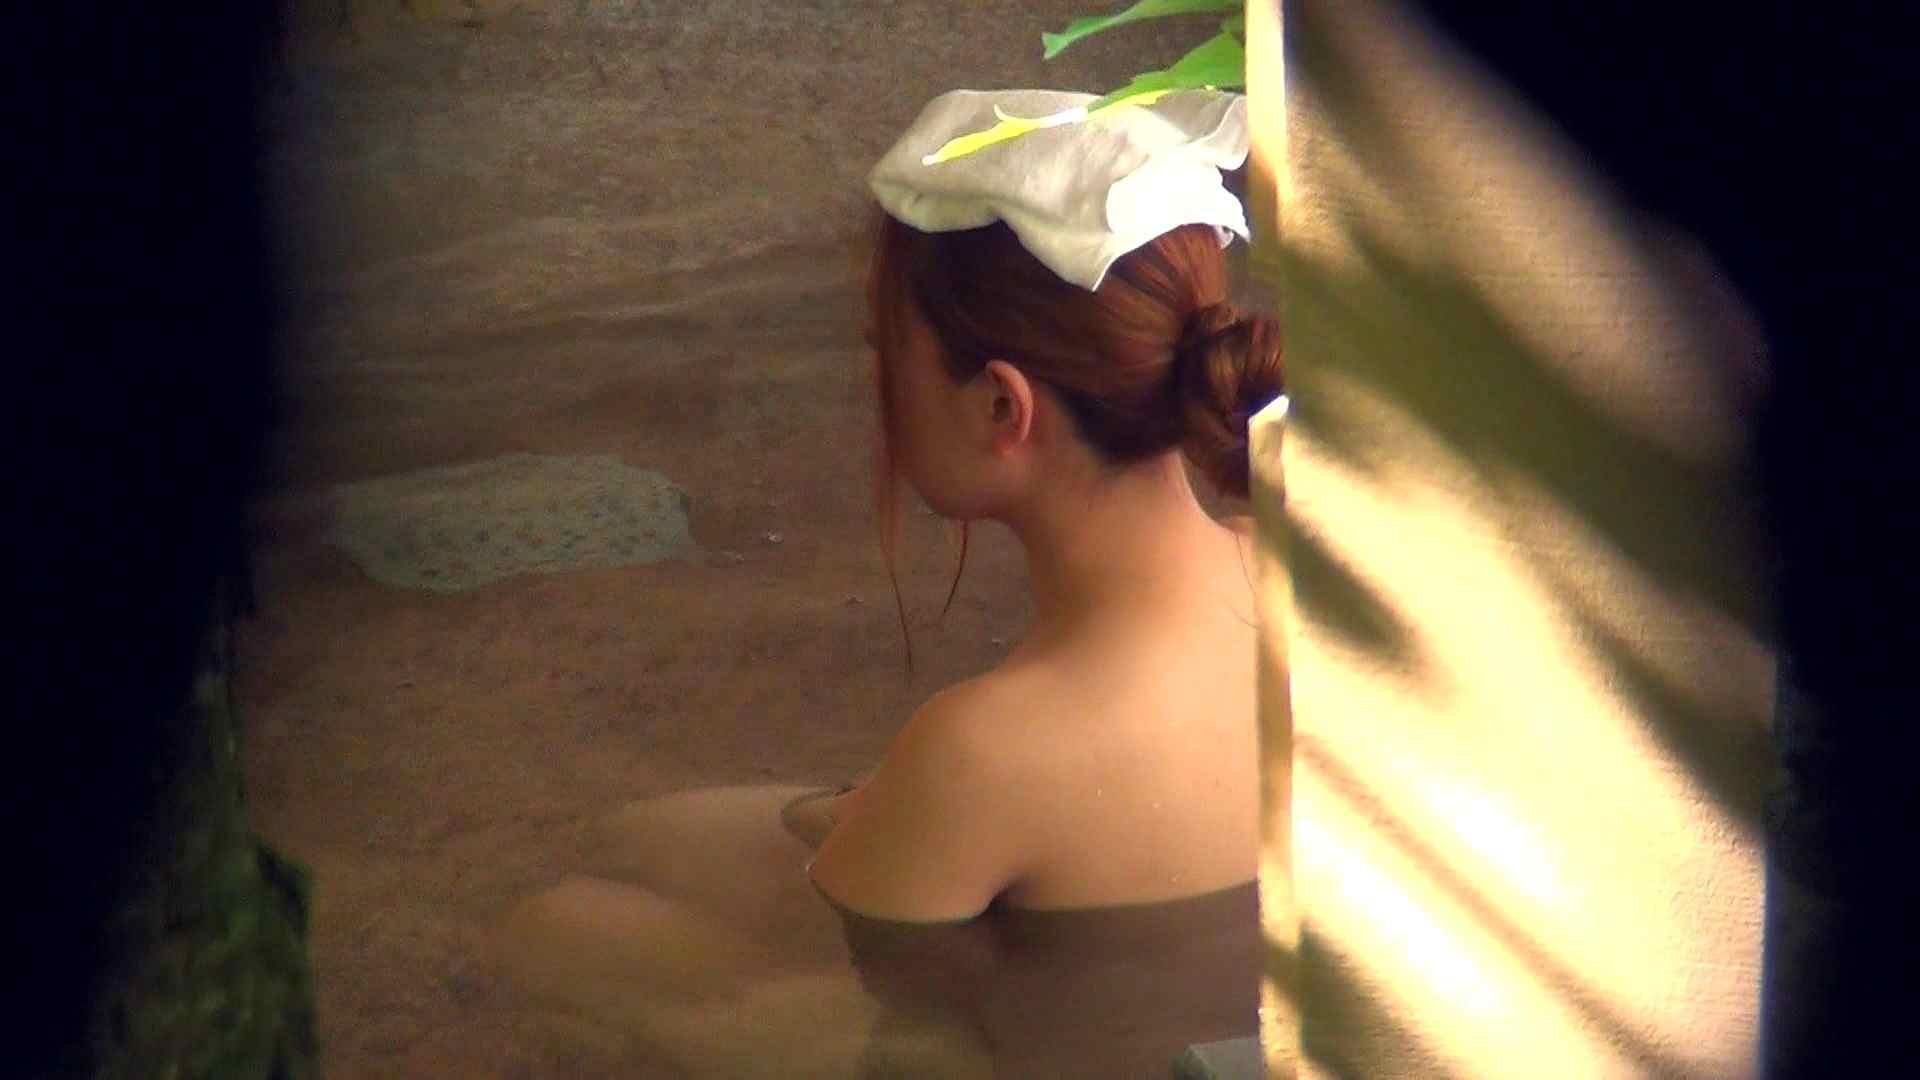 Aquaな露天風呂Vol.270 露天風呂   OLのエロ生活  74連発 73